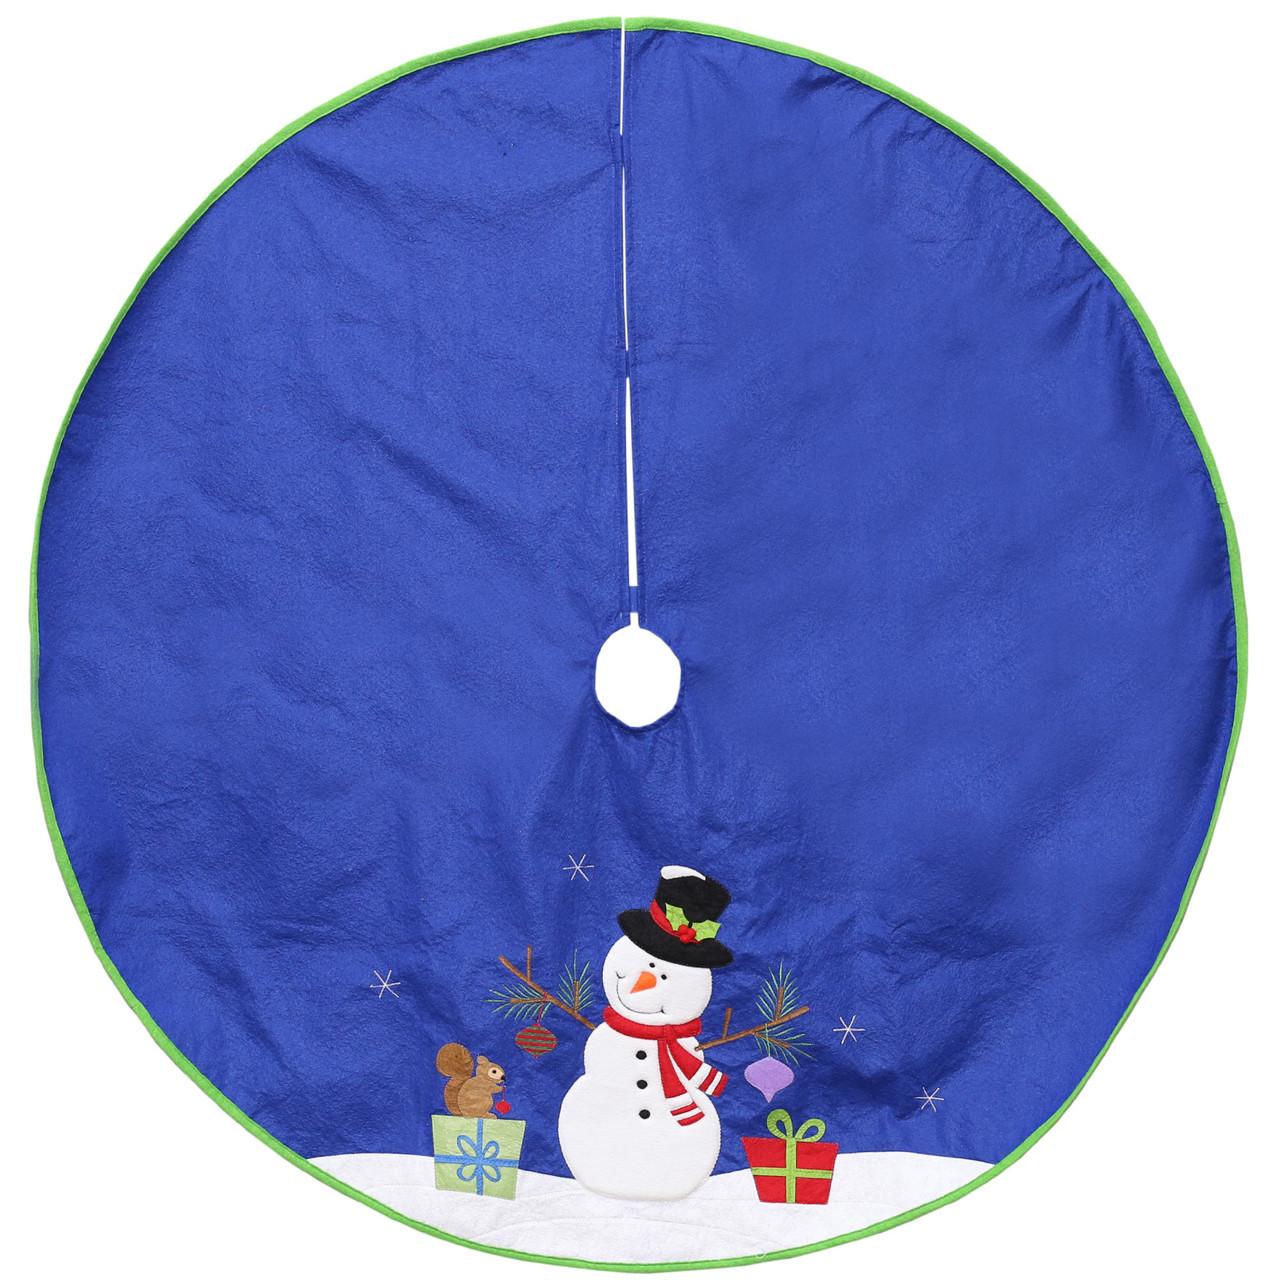 48 Blue Felt Christmas Snowman Winter Tree Skirt With Bright Green Trim 32634004